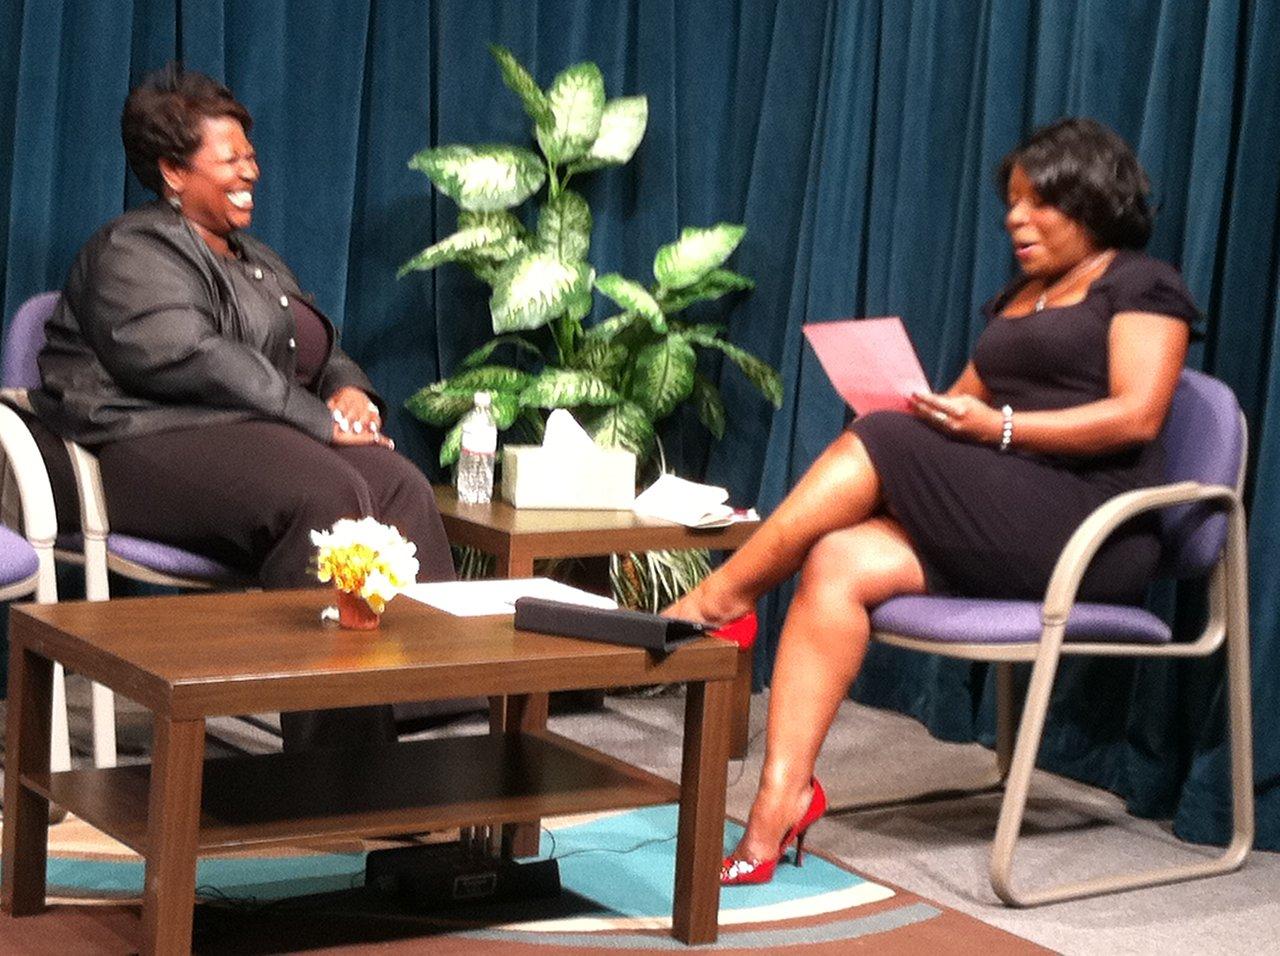 Interview with Yolanda Green